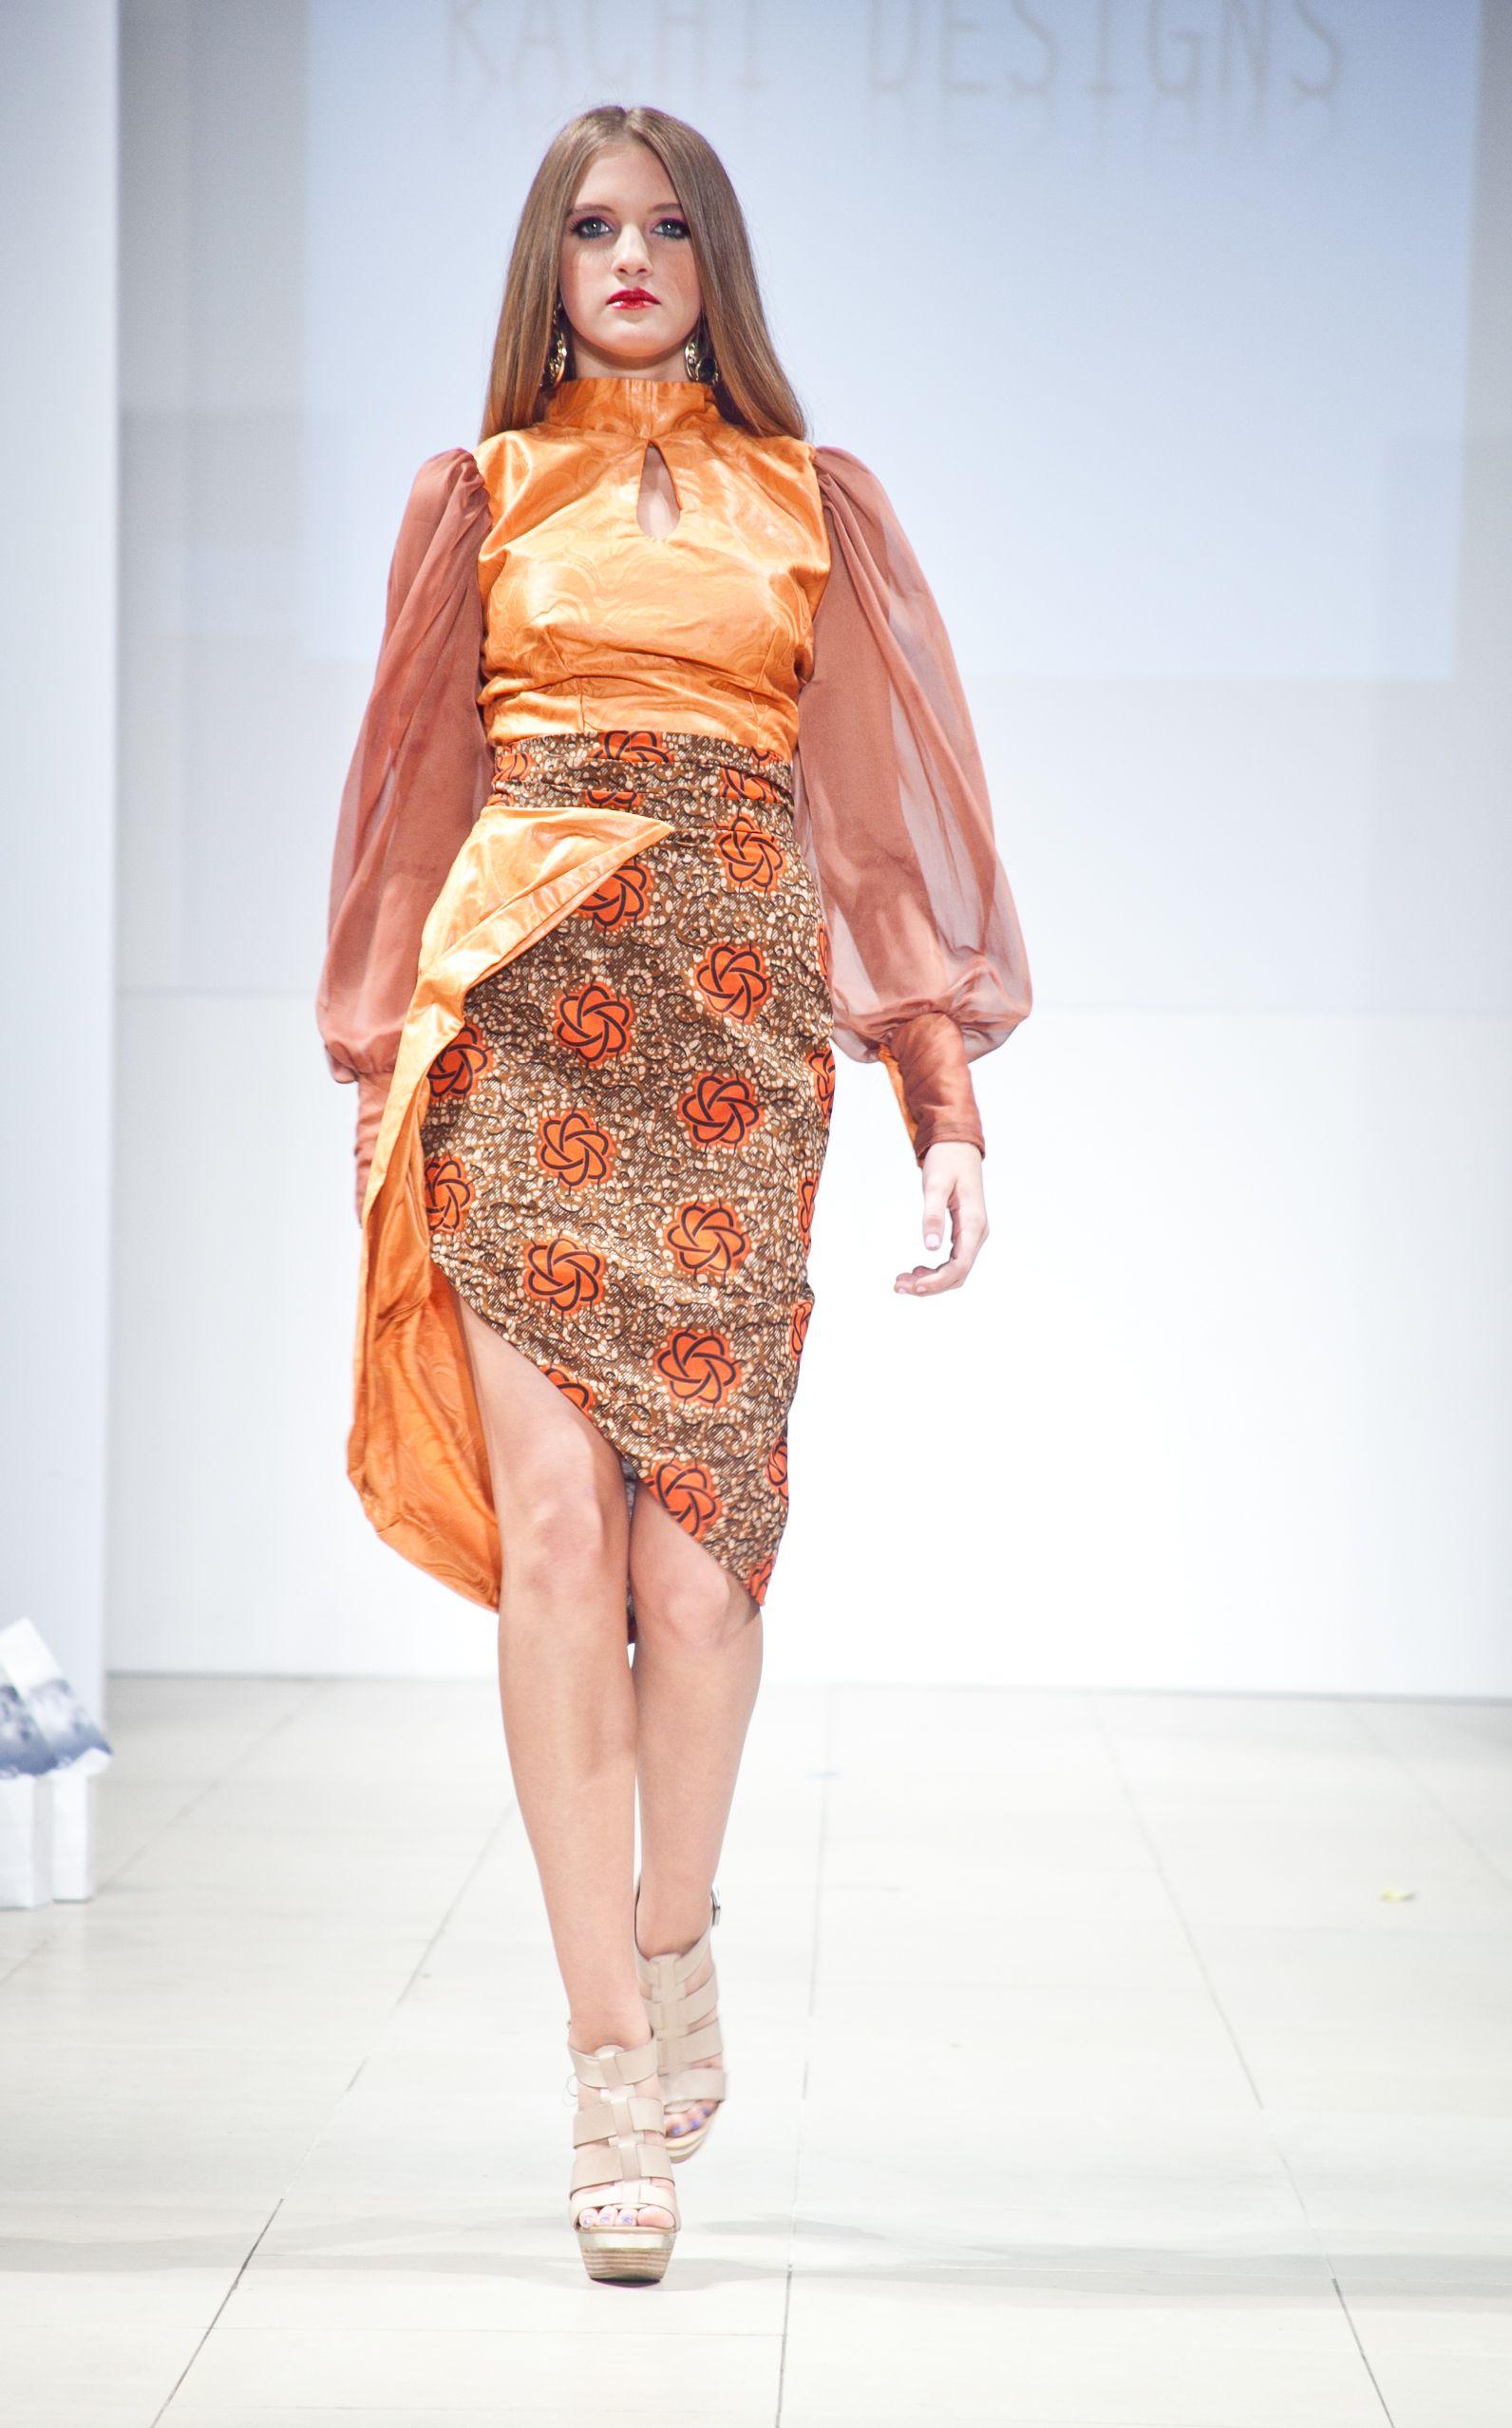 Adiree Special Events : KACHI DESIGNS @afwny 2012 #nigeria #designer #fashion #africanfashion #fashion #pr #luxury #africafashionweek #africa #press #nyfw SATURDAY | 07/14 | 7:00PM Broad Street Ballroom | 41 Broad Street | New York, NY 10004 #AdireeSpecialEvents